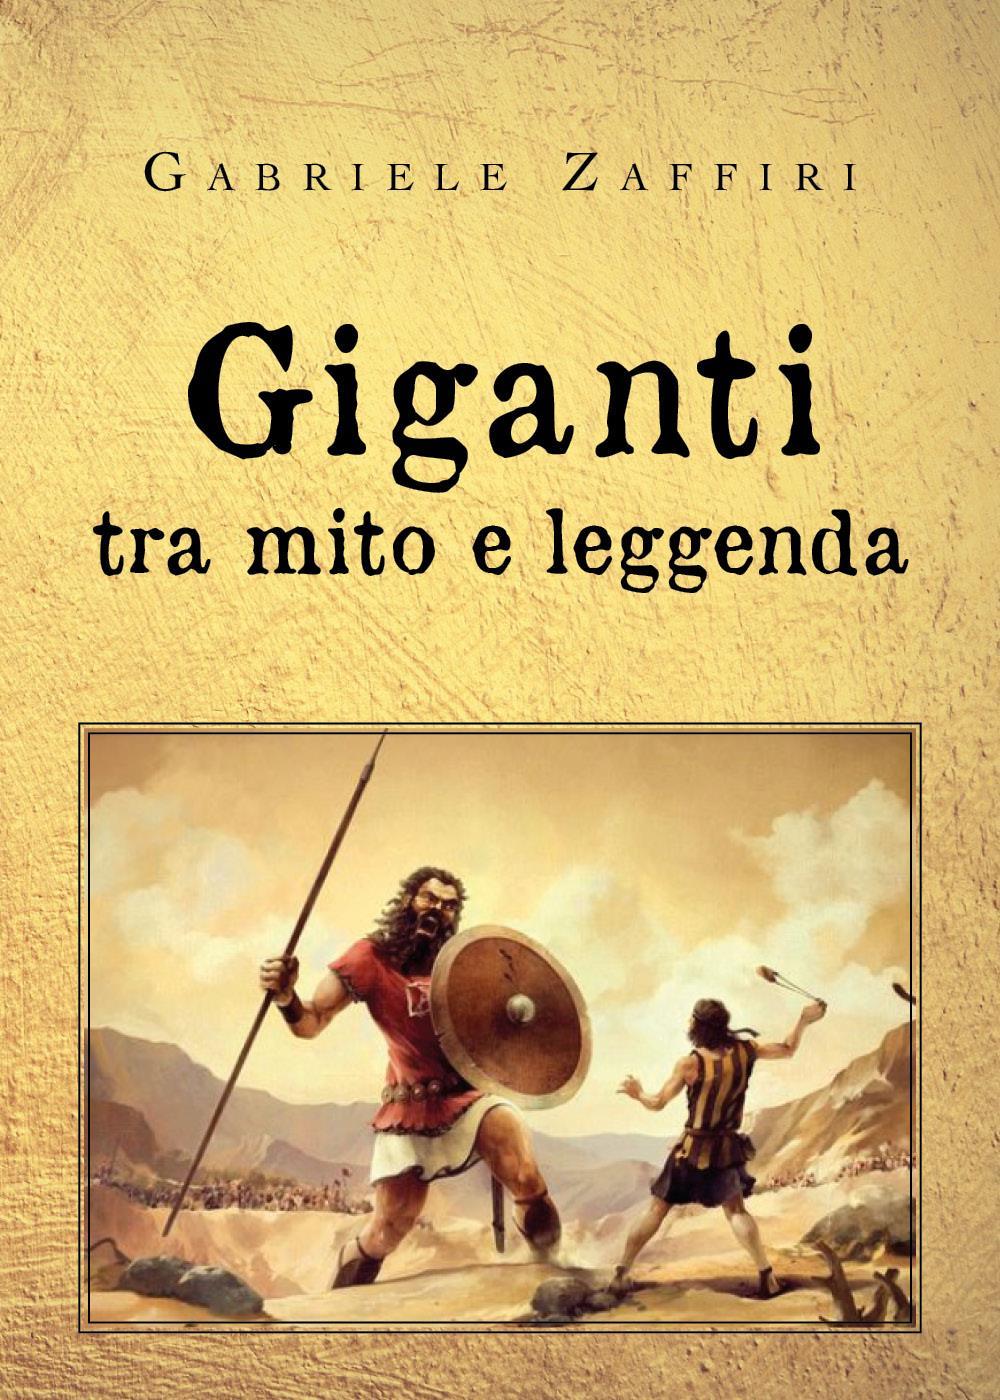 Giganti, tra mito e leggenda